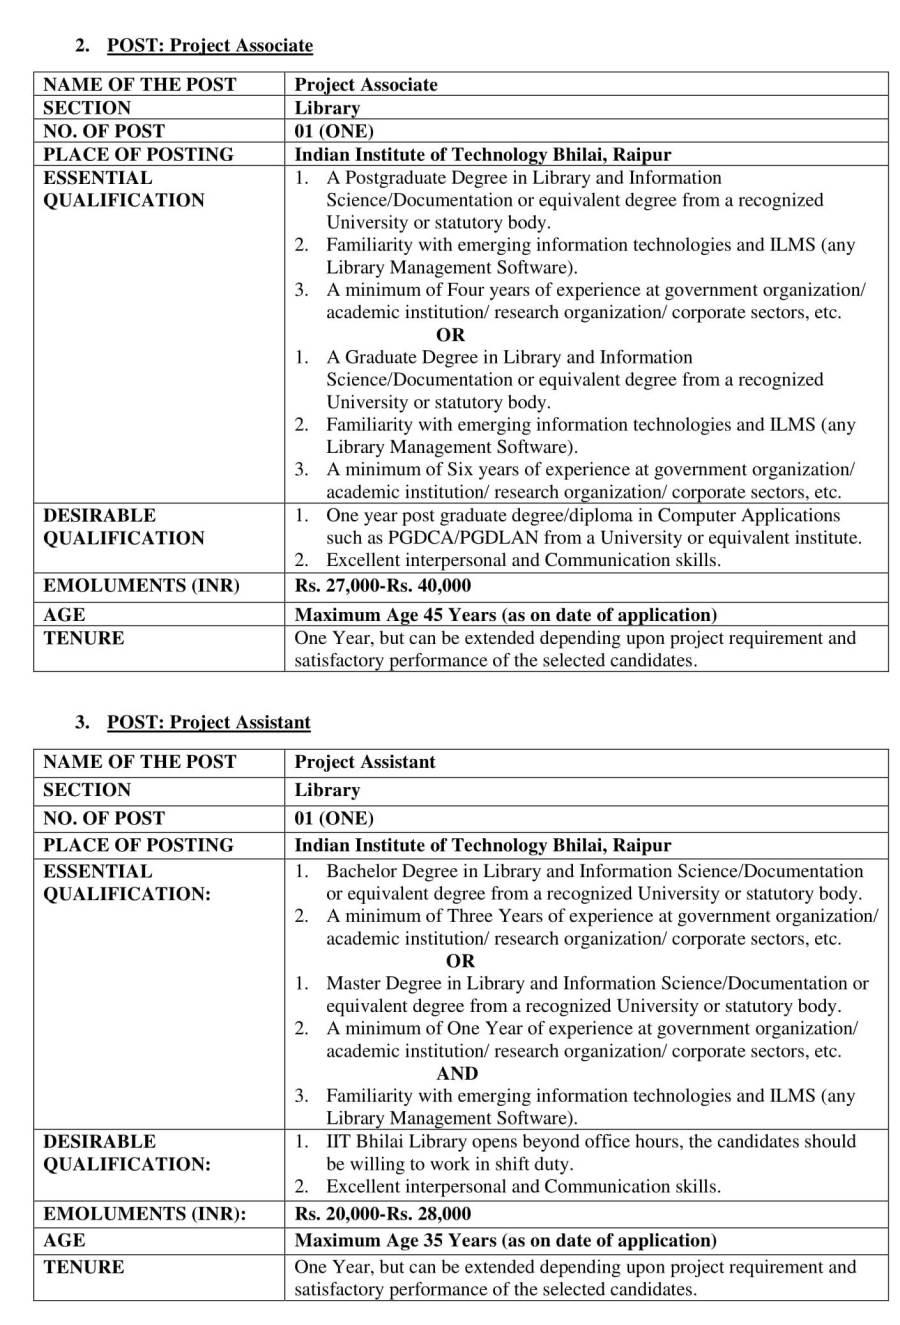 2017-7-18-Draft Advertisement for project staffs- IIT BHILAI-NEW-2.jpg